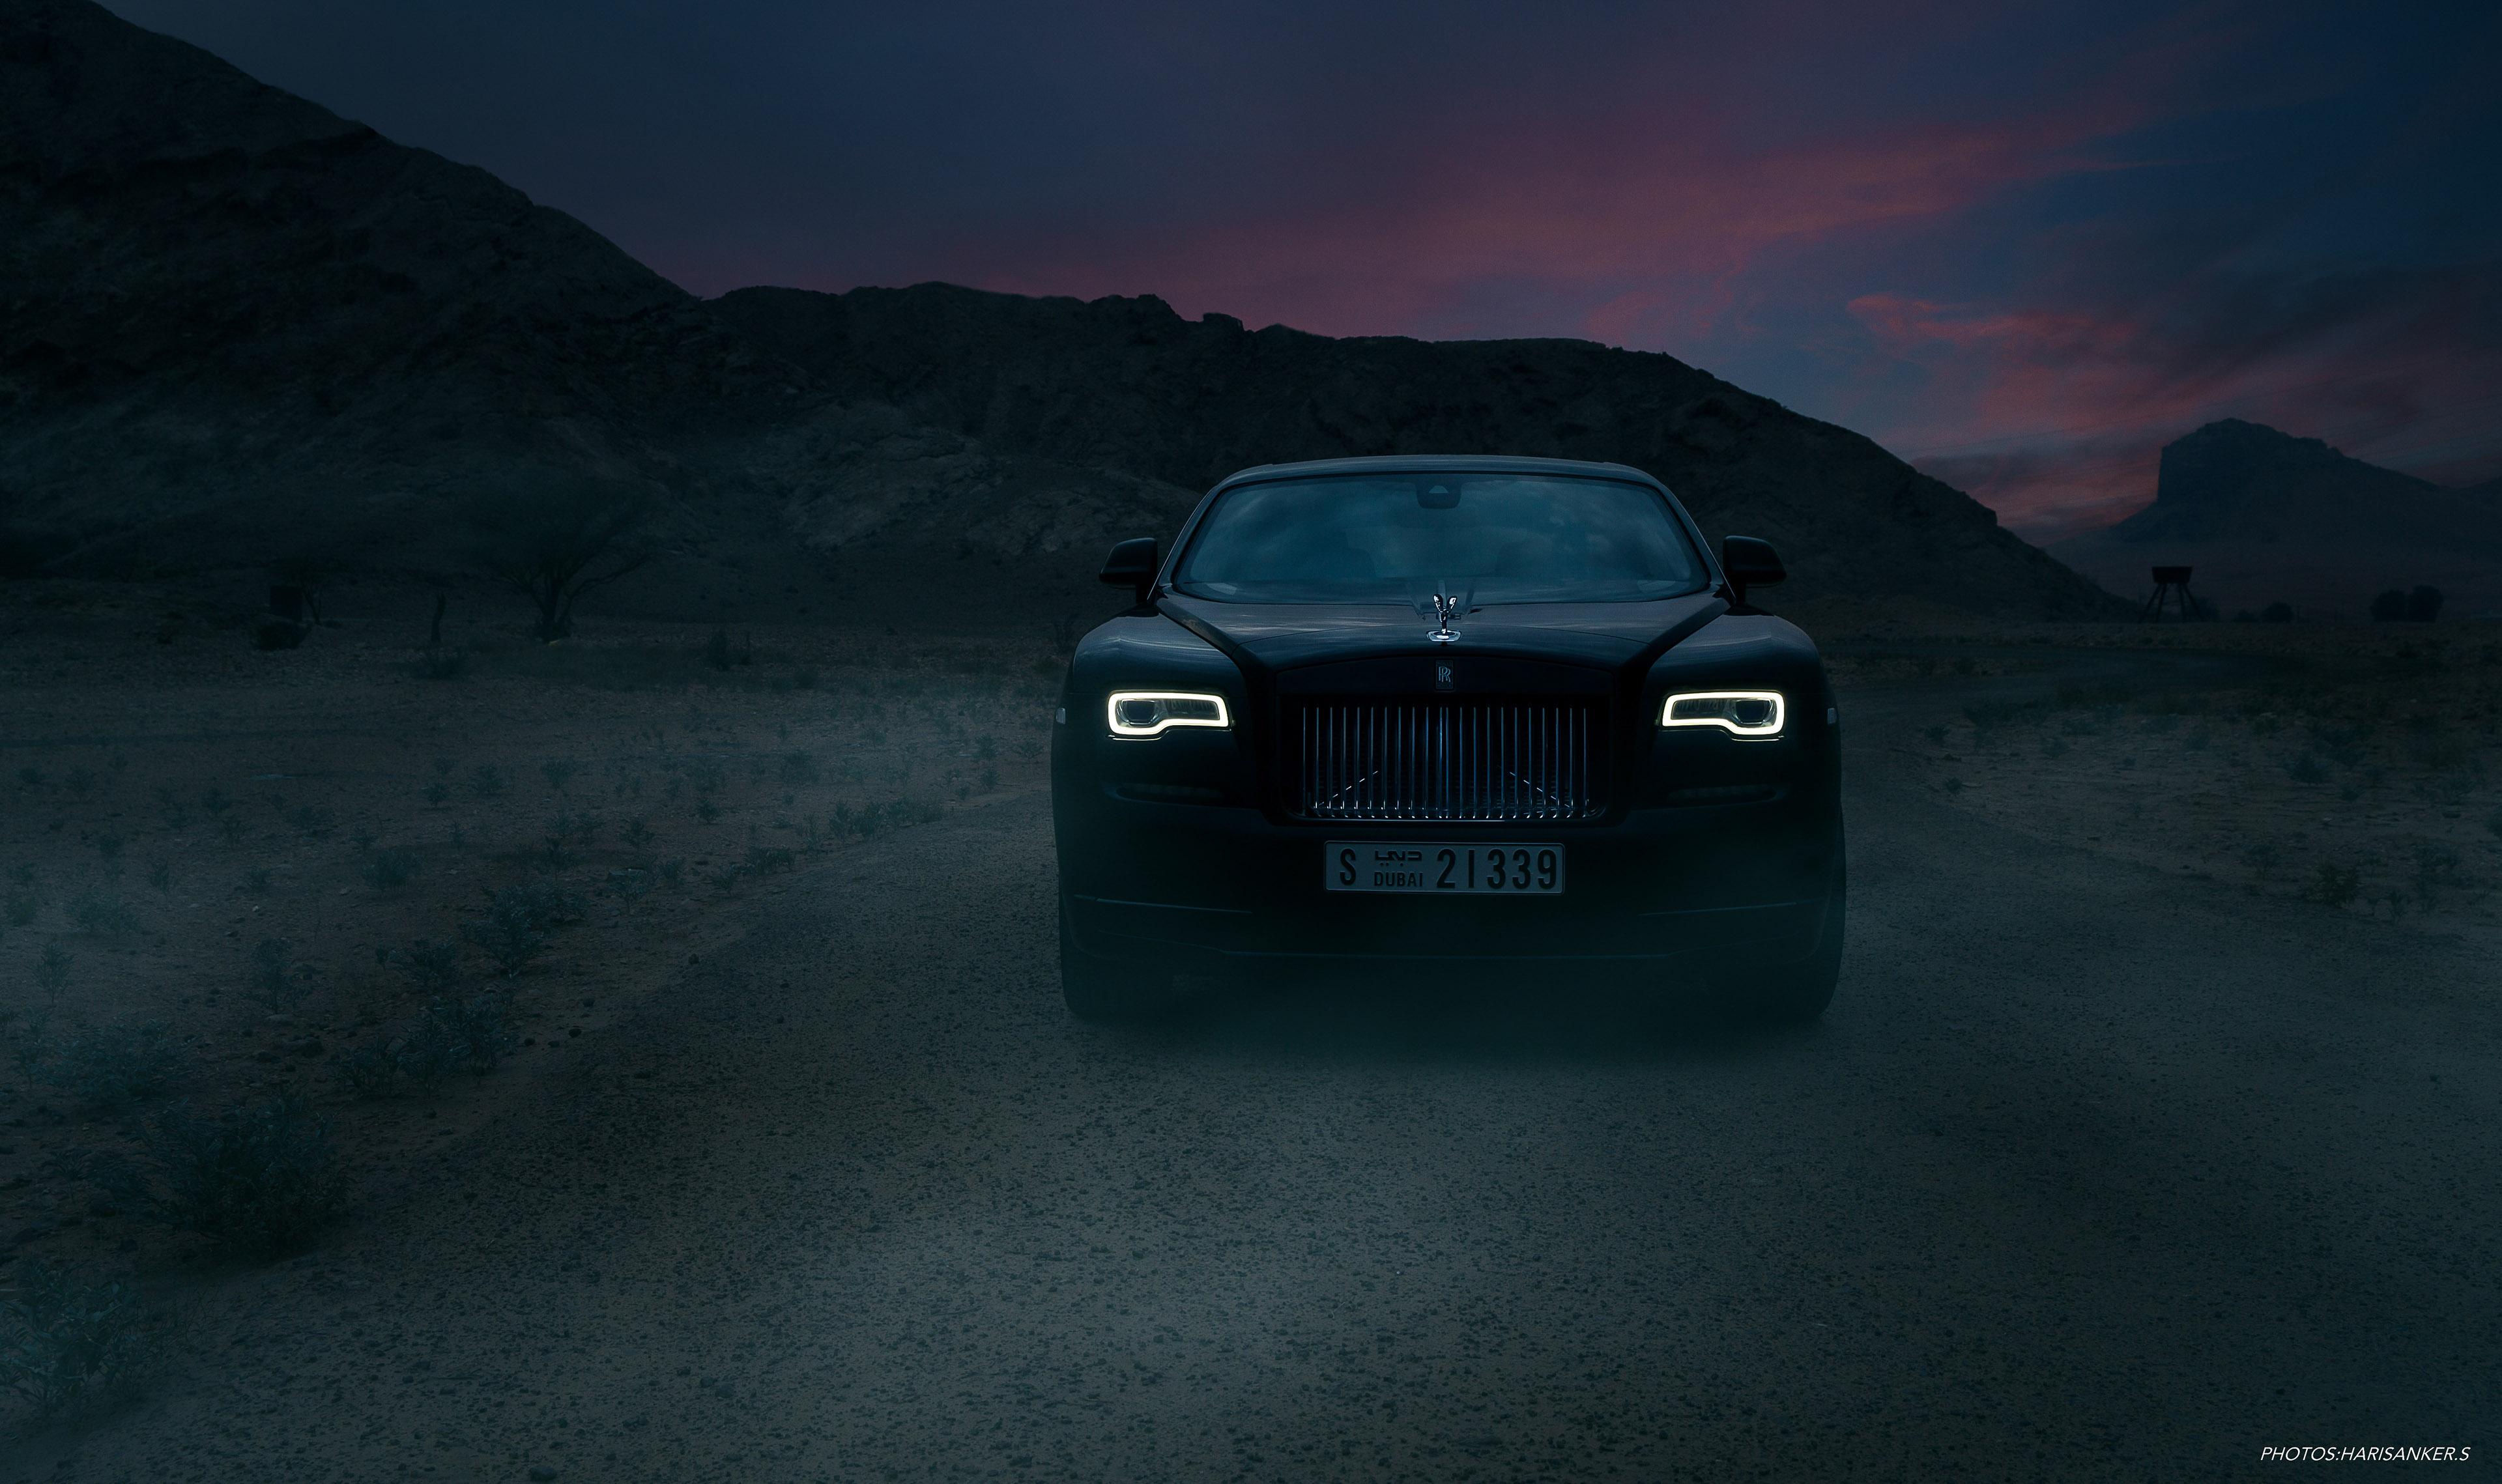 Rolls Royce Wraith Black Badge, HD Cars, 4k Wallpapers ...